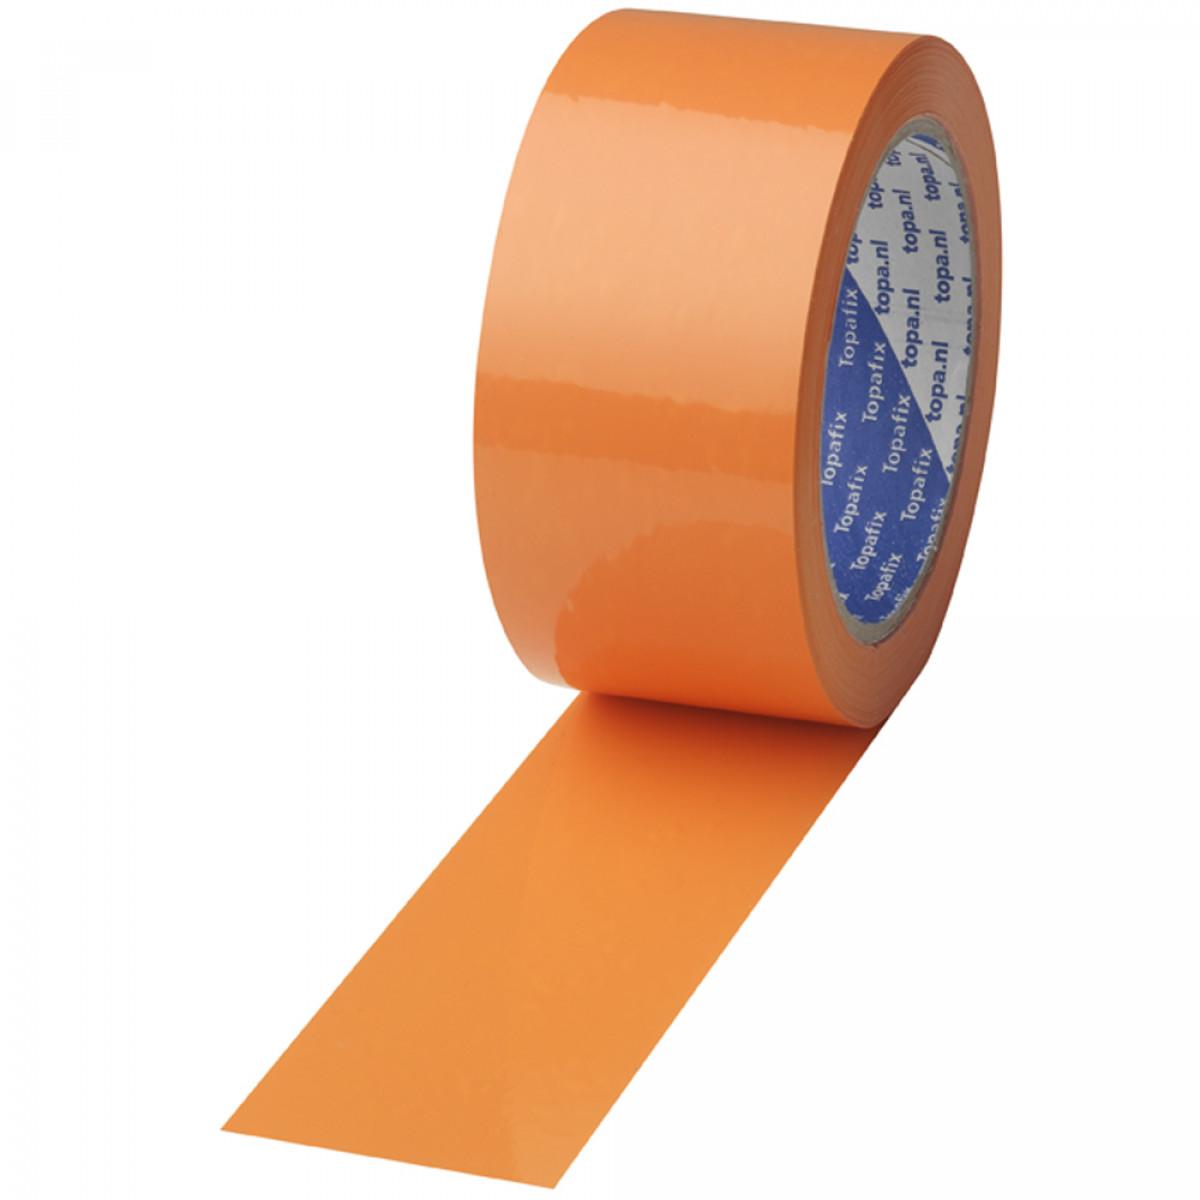 Topafix 50/66 Fluor oranje